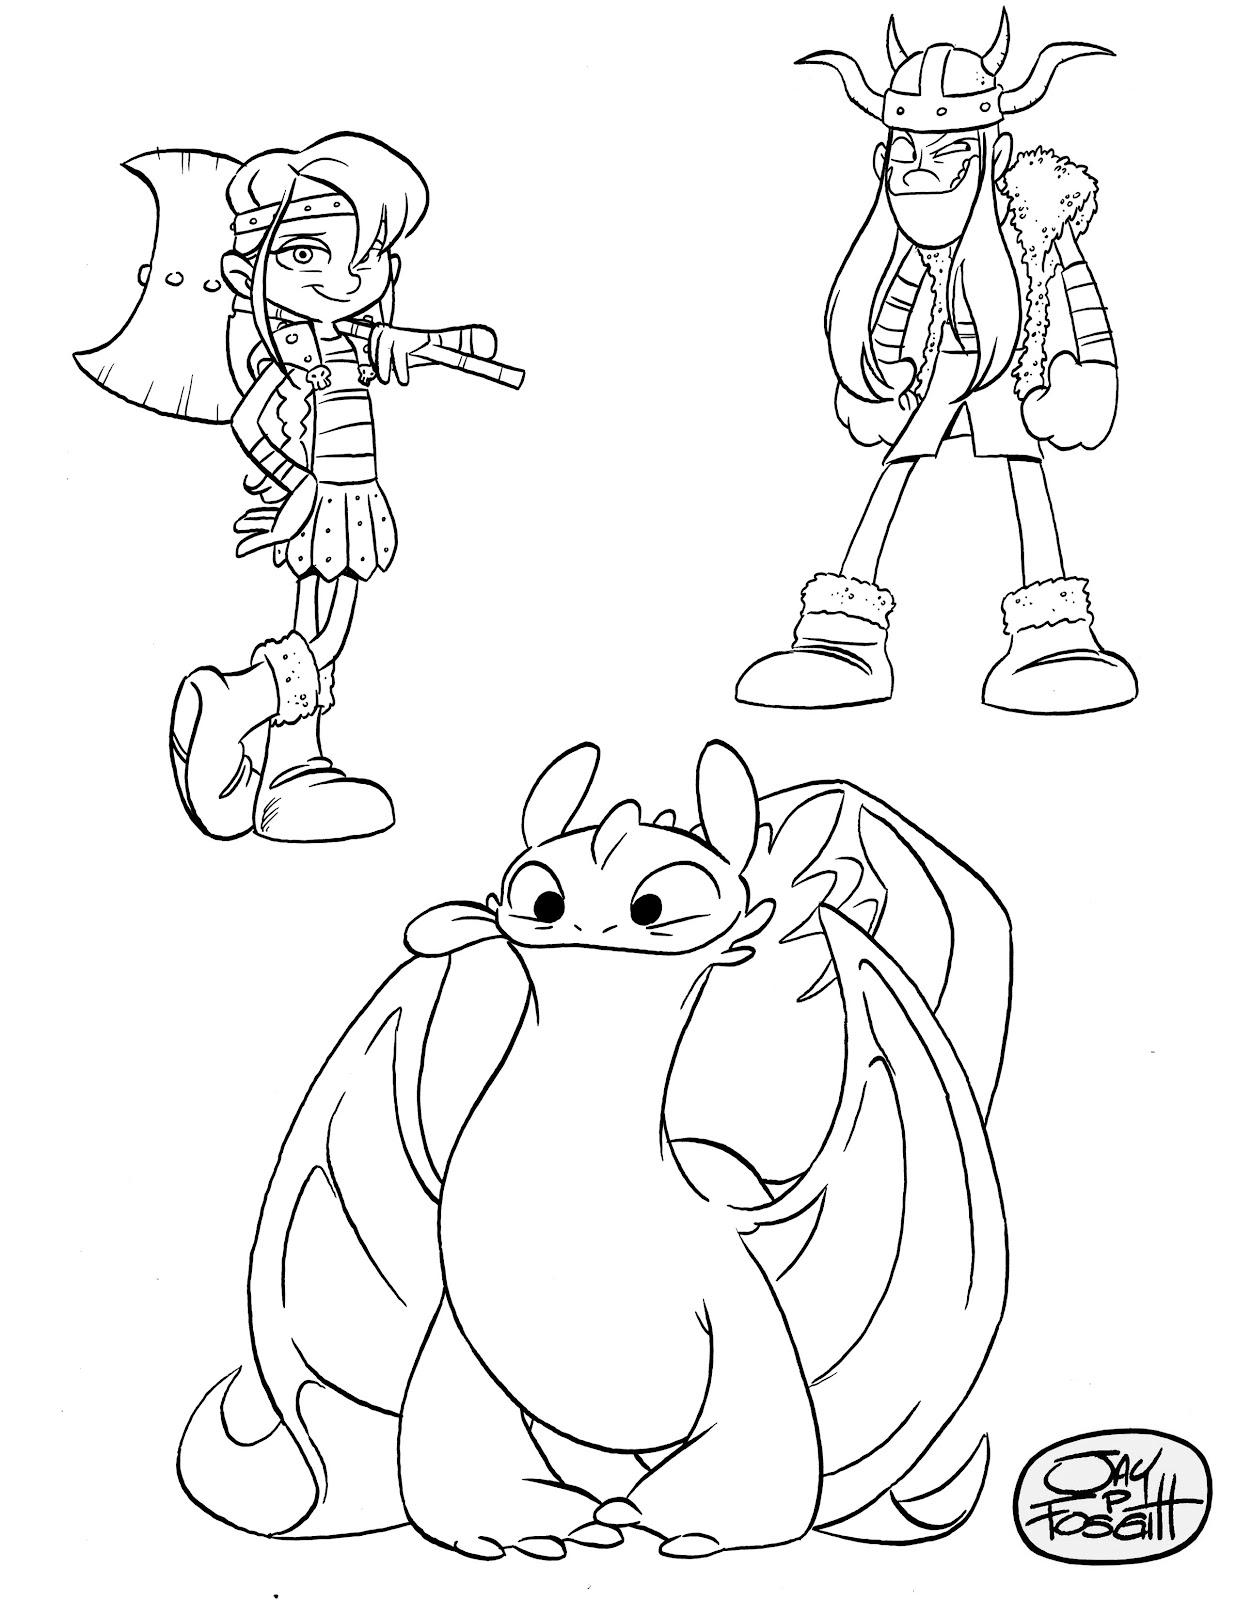 Dreamworksanimation dragons free coloring pages for Dreamworks coloring pages